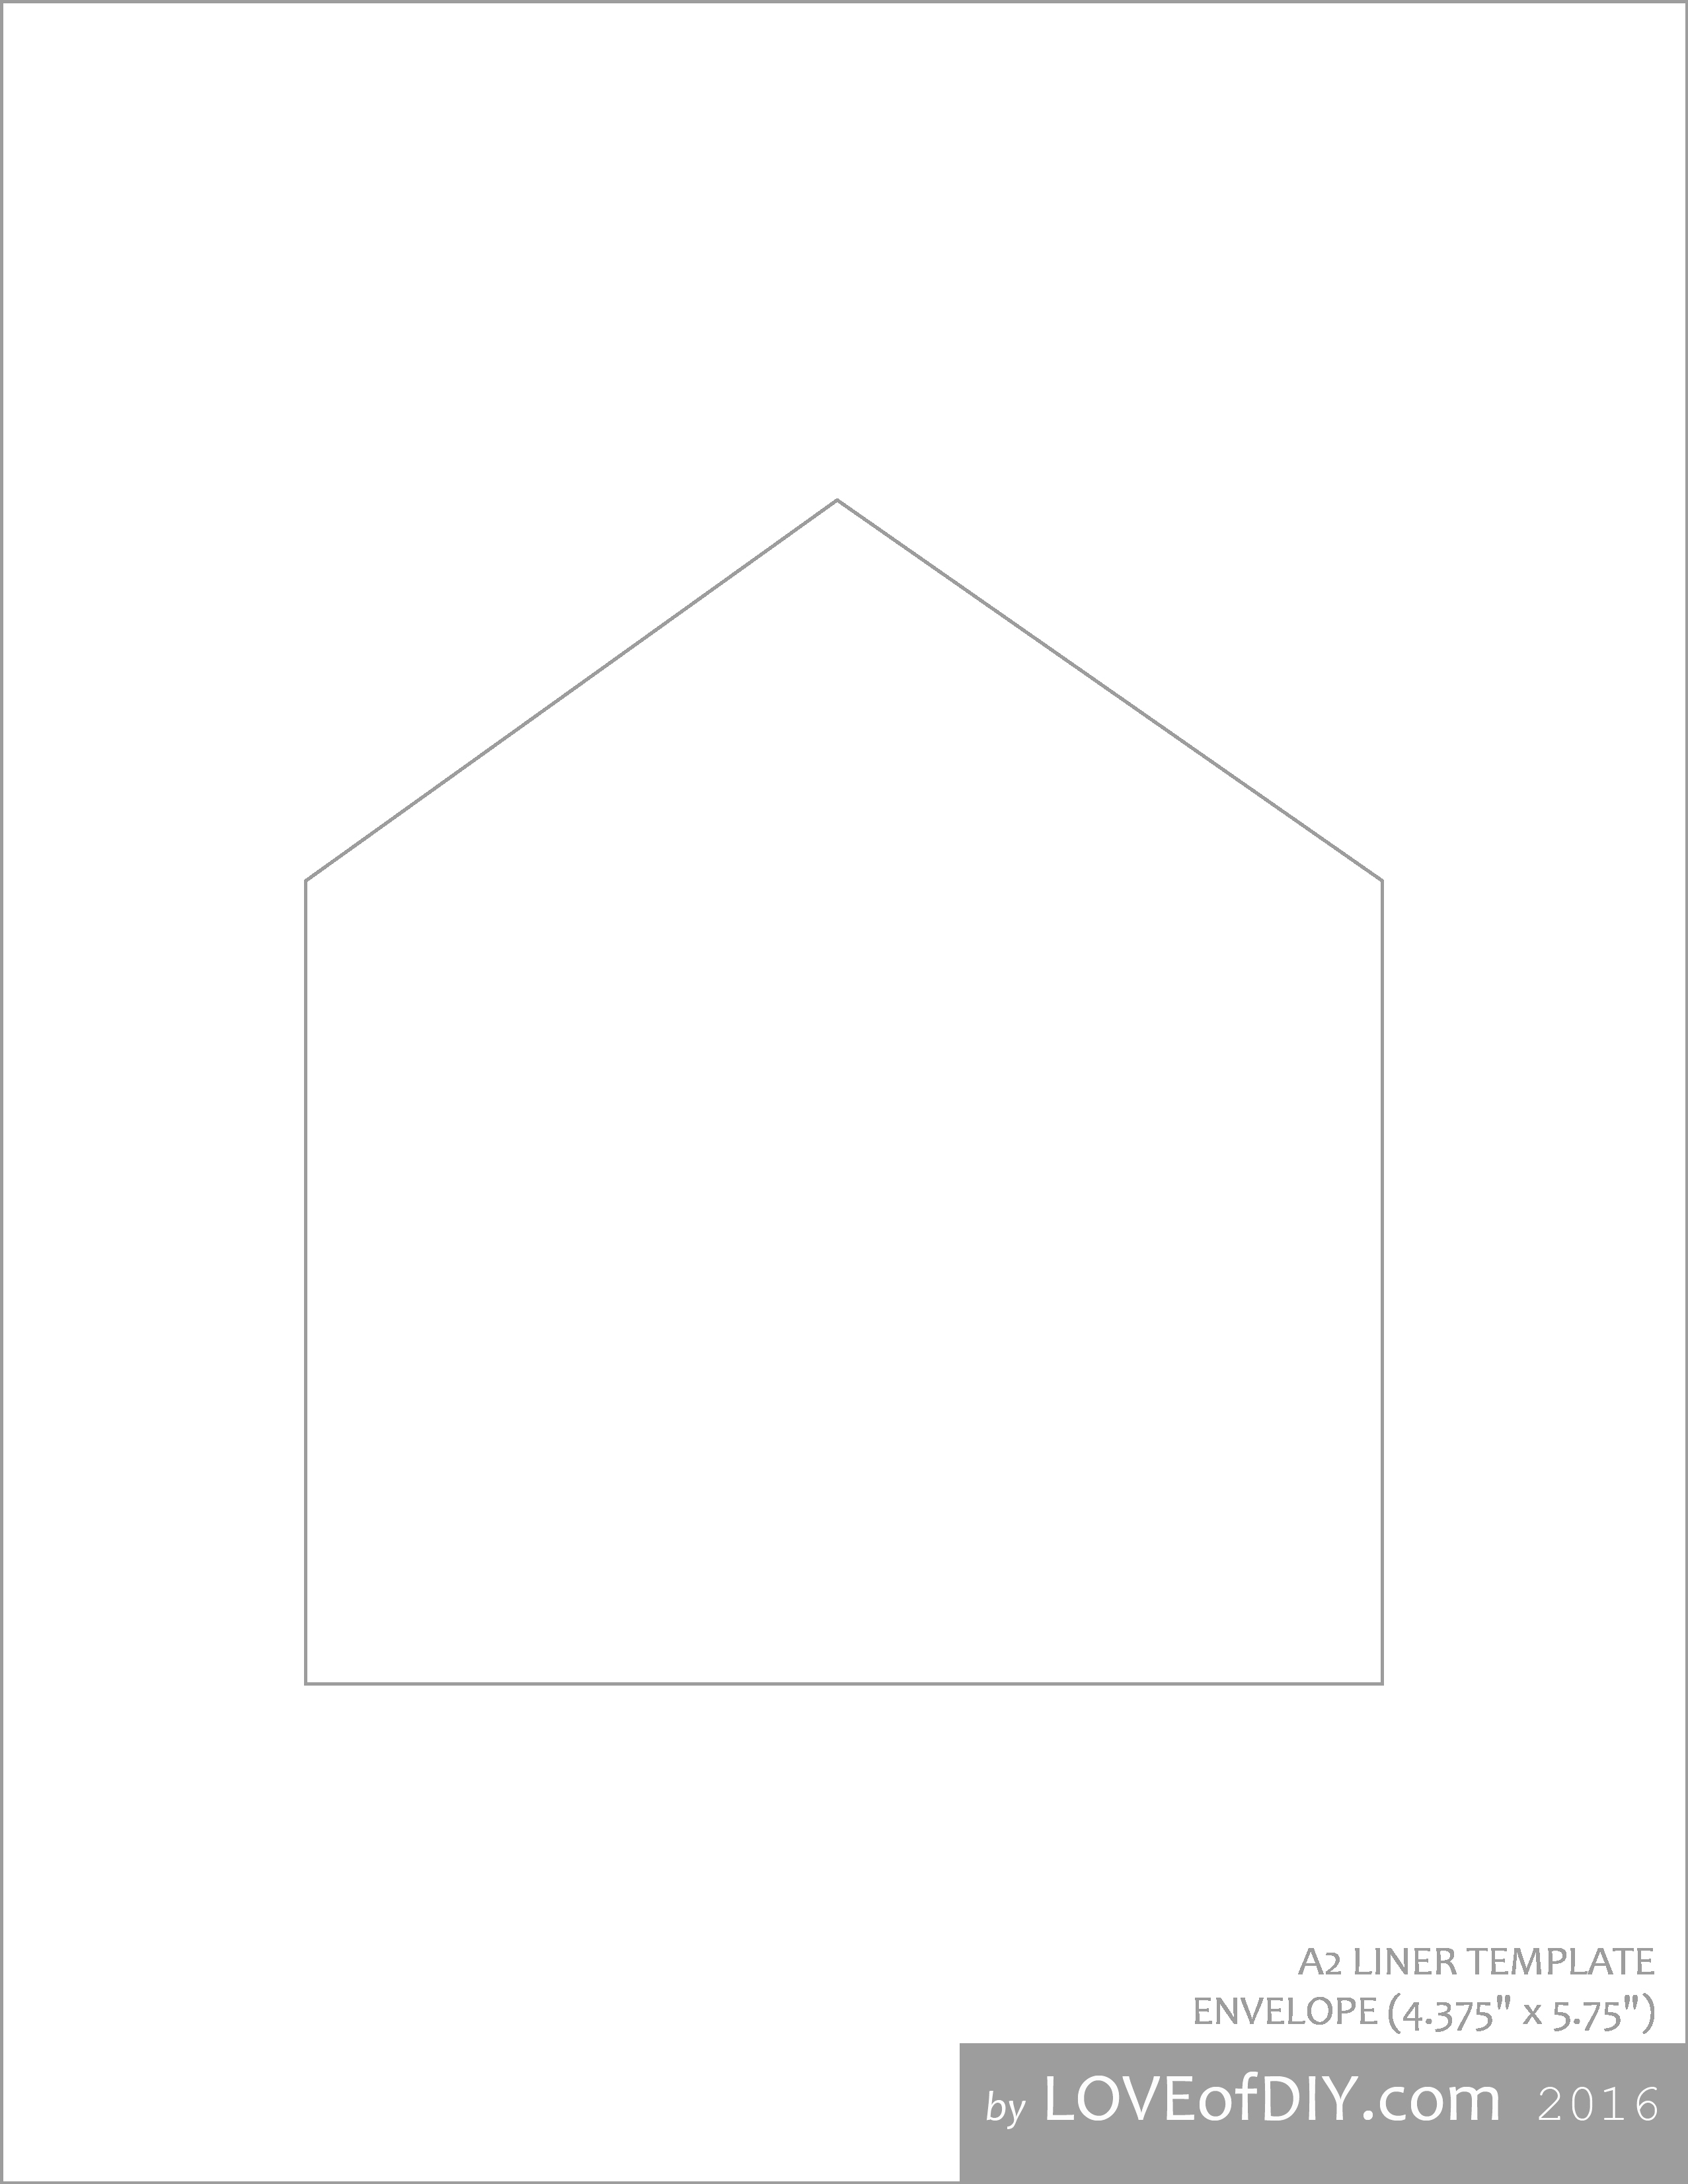 A2 Envelope Template Word Elegant Envelope Liner Tutorial